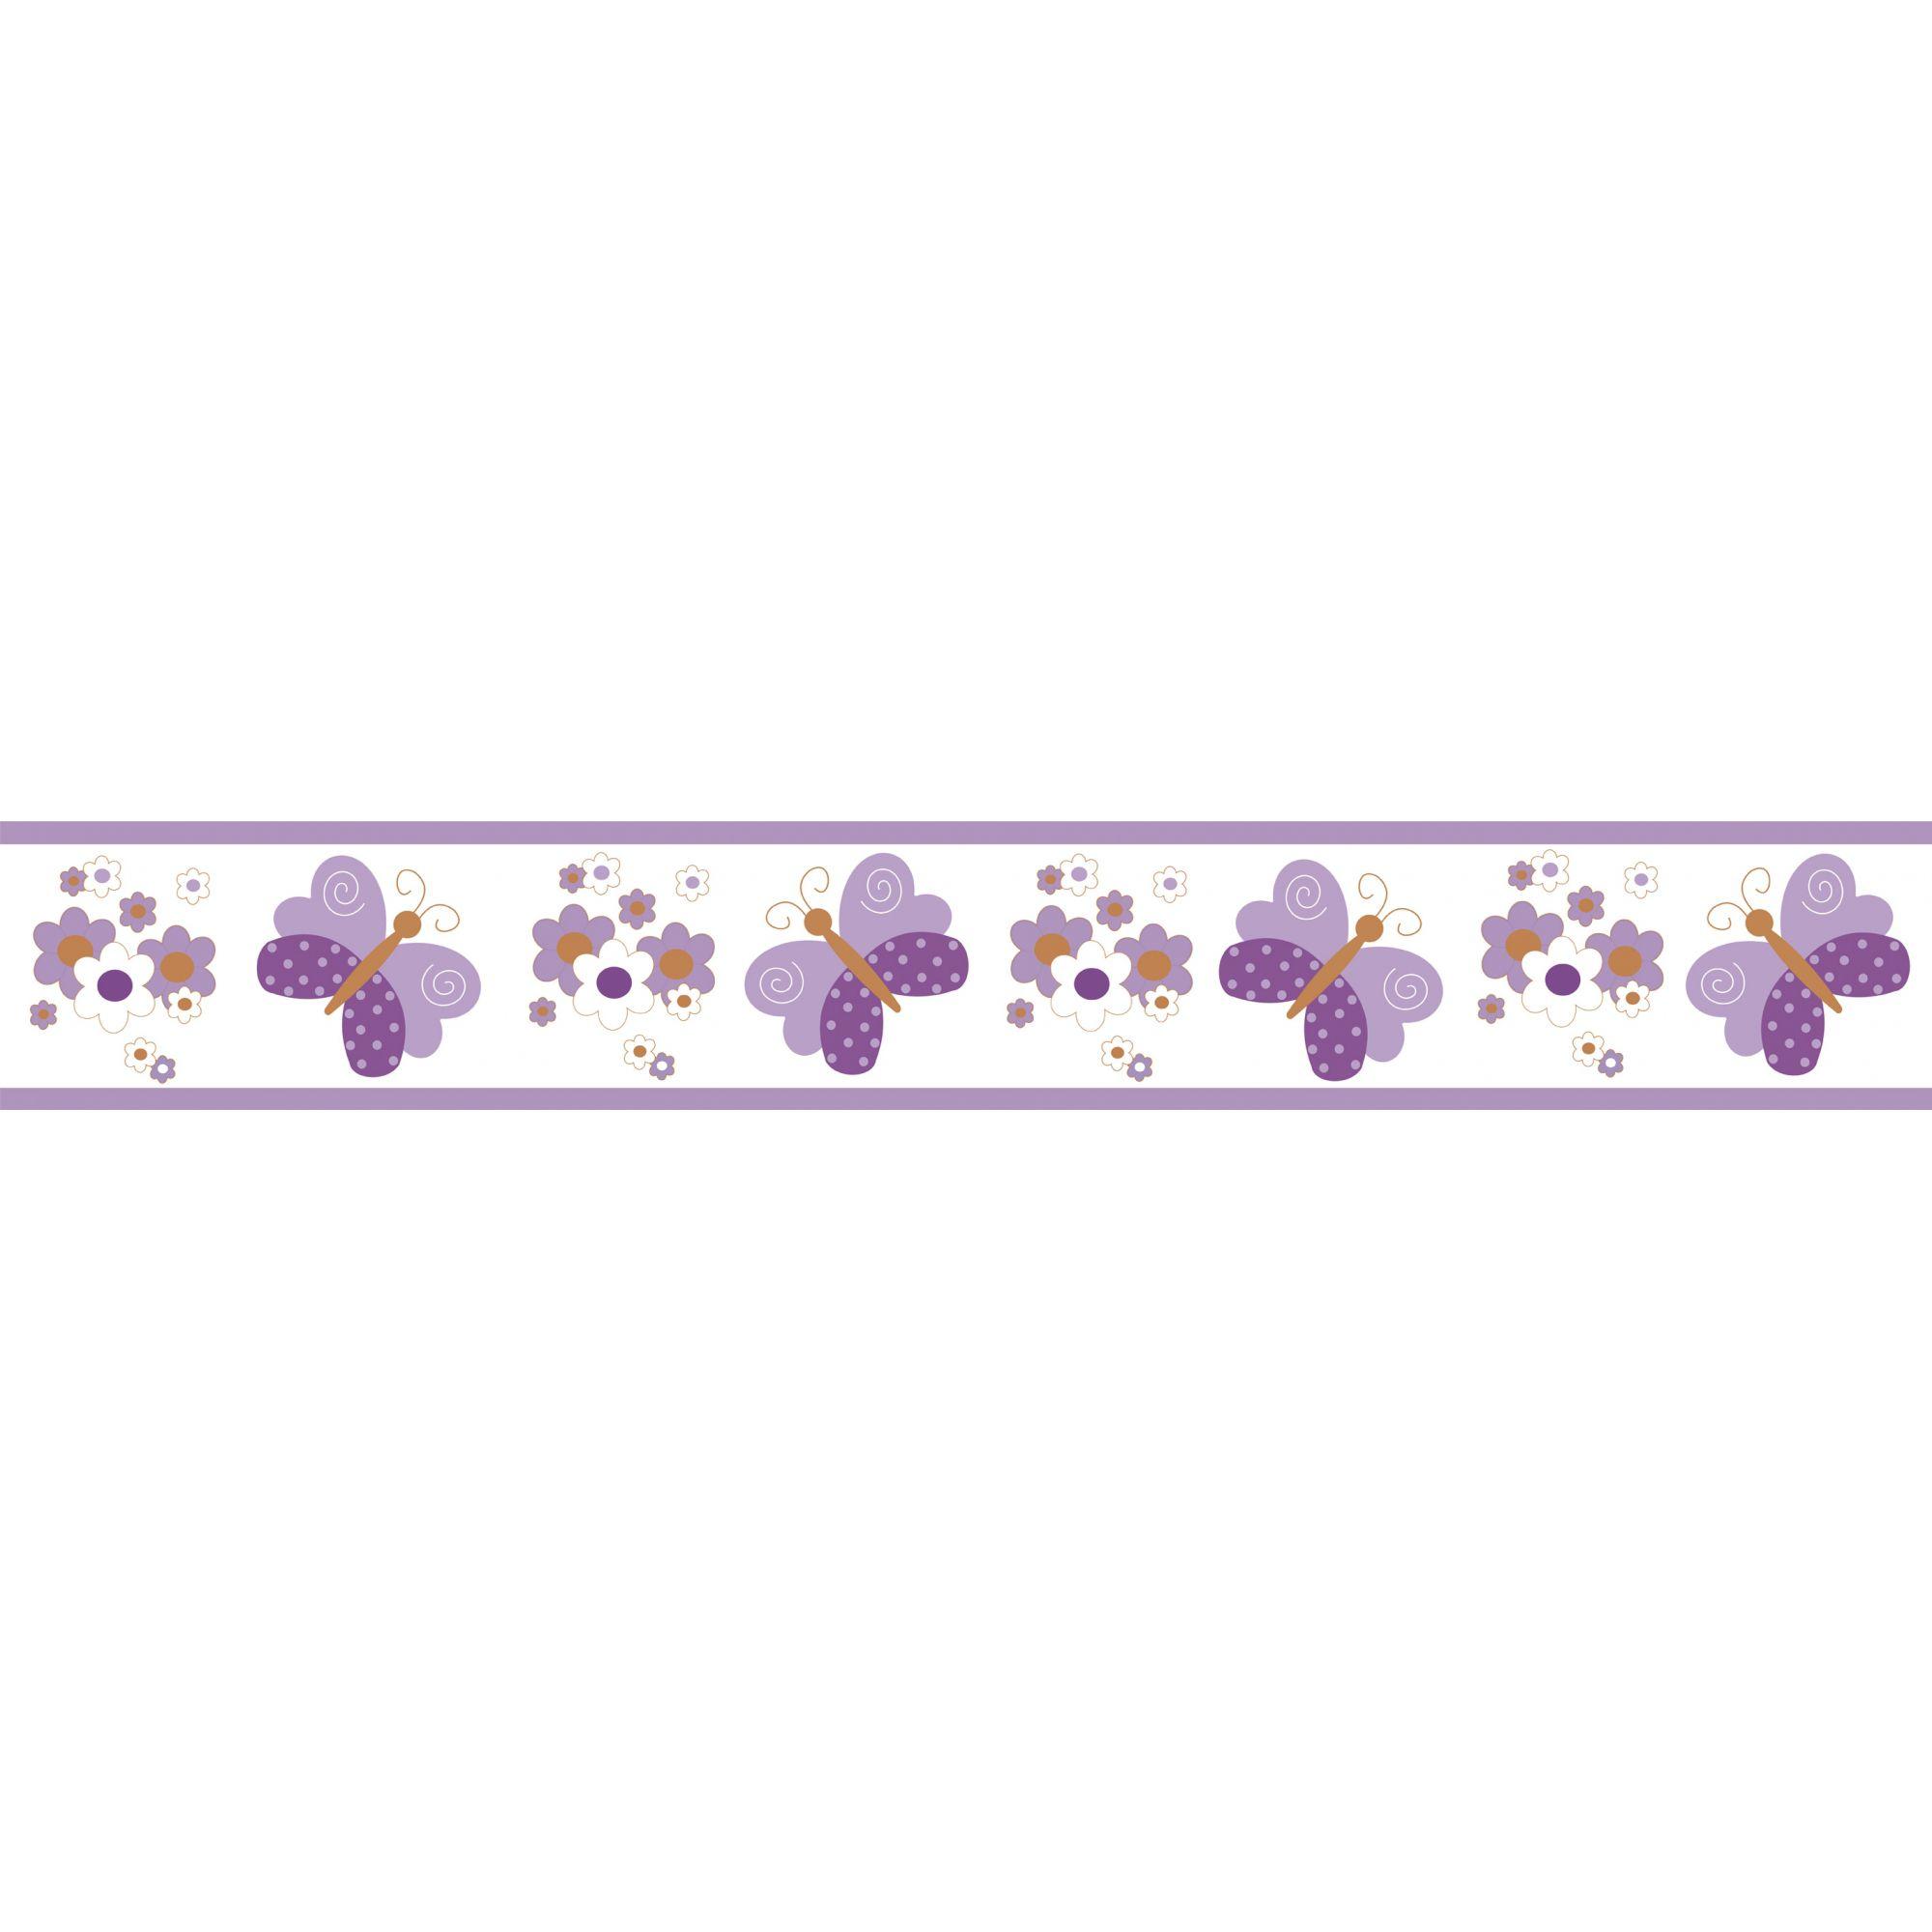 Faixa Decorativa Adesiva Borboletas  - Final Decor